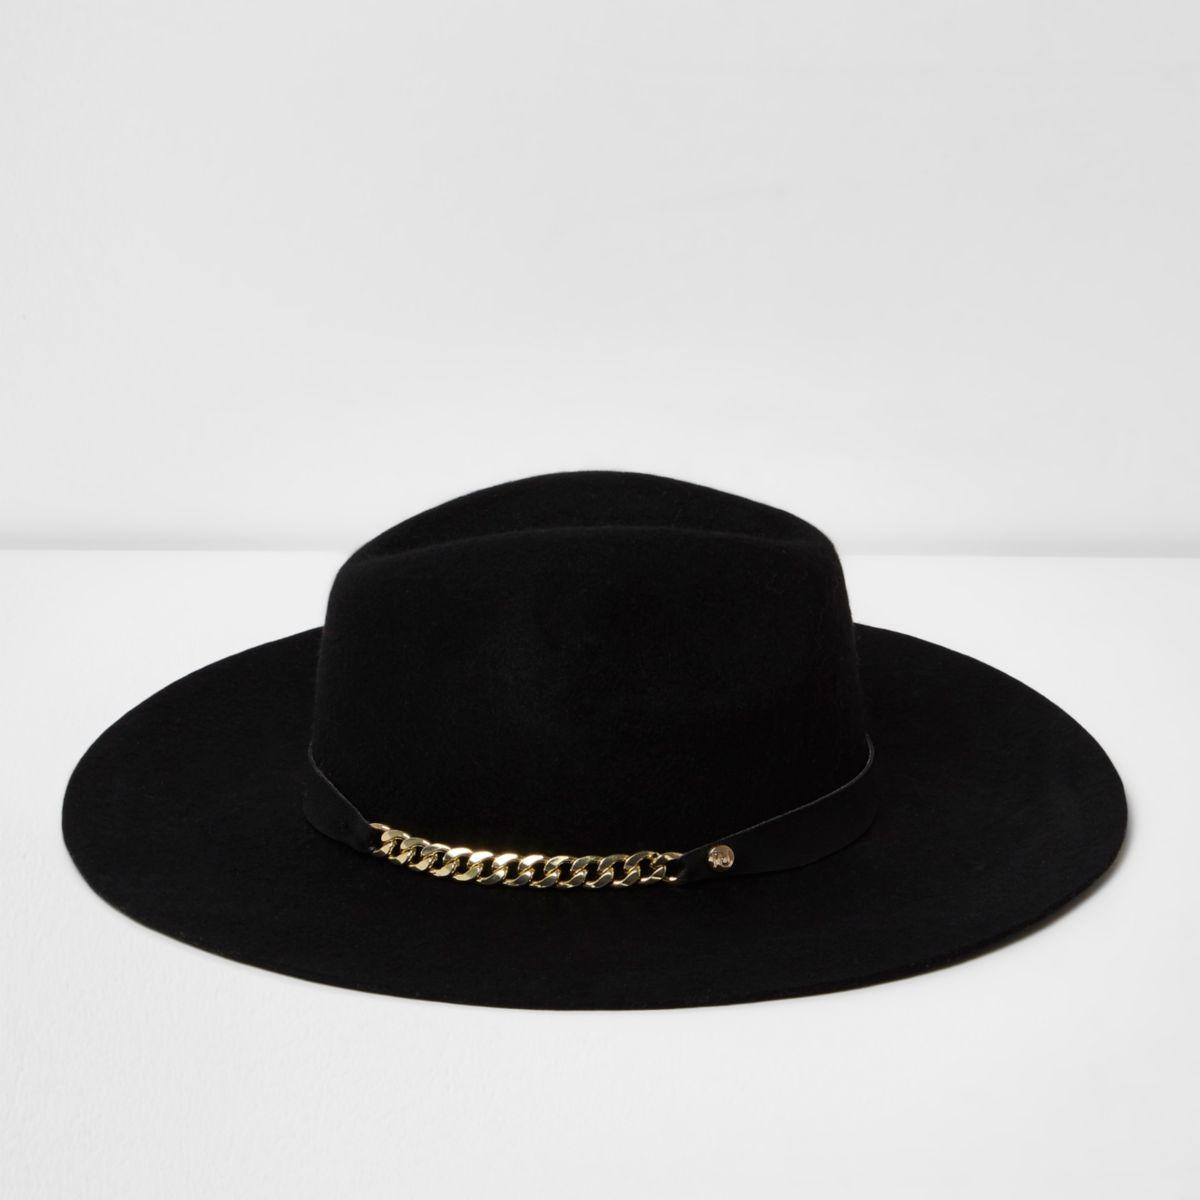 River Island Fedora Hat